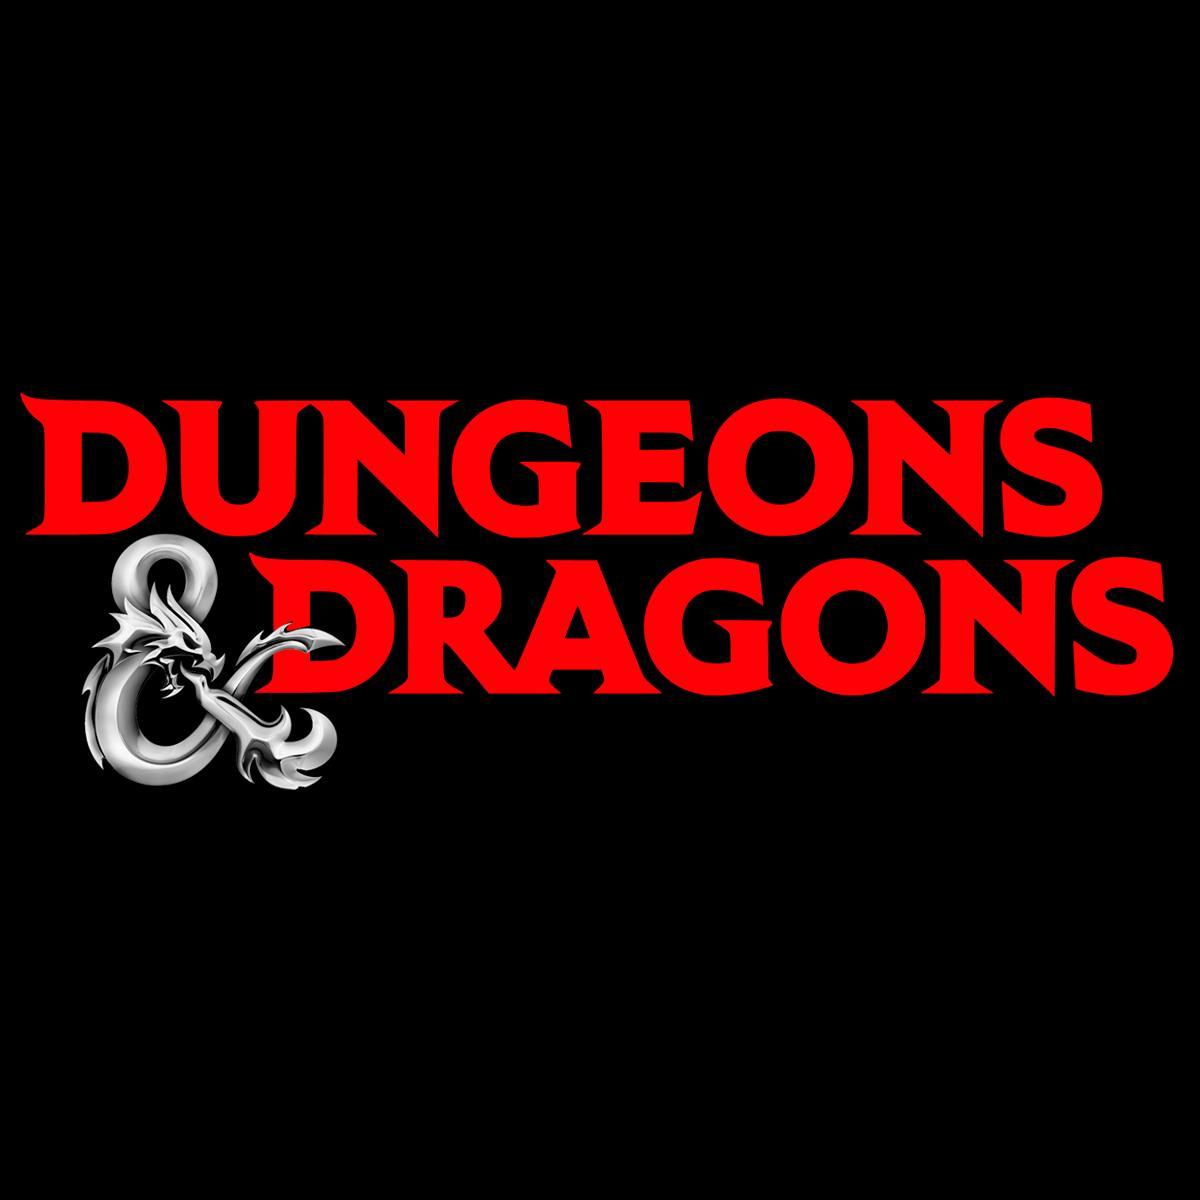 Dungeons and Dragons Minitomo Magias Arcanas Deck RPG